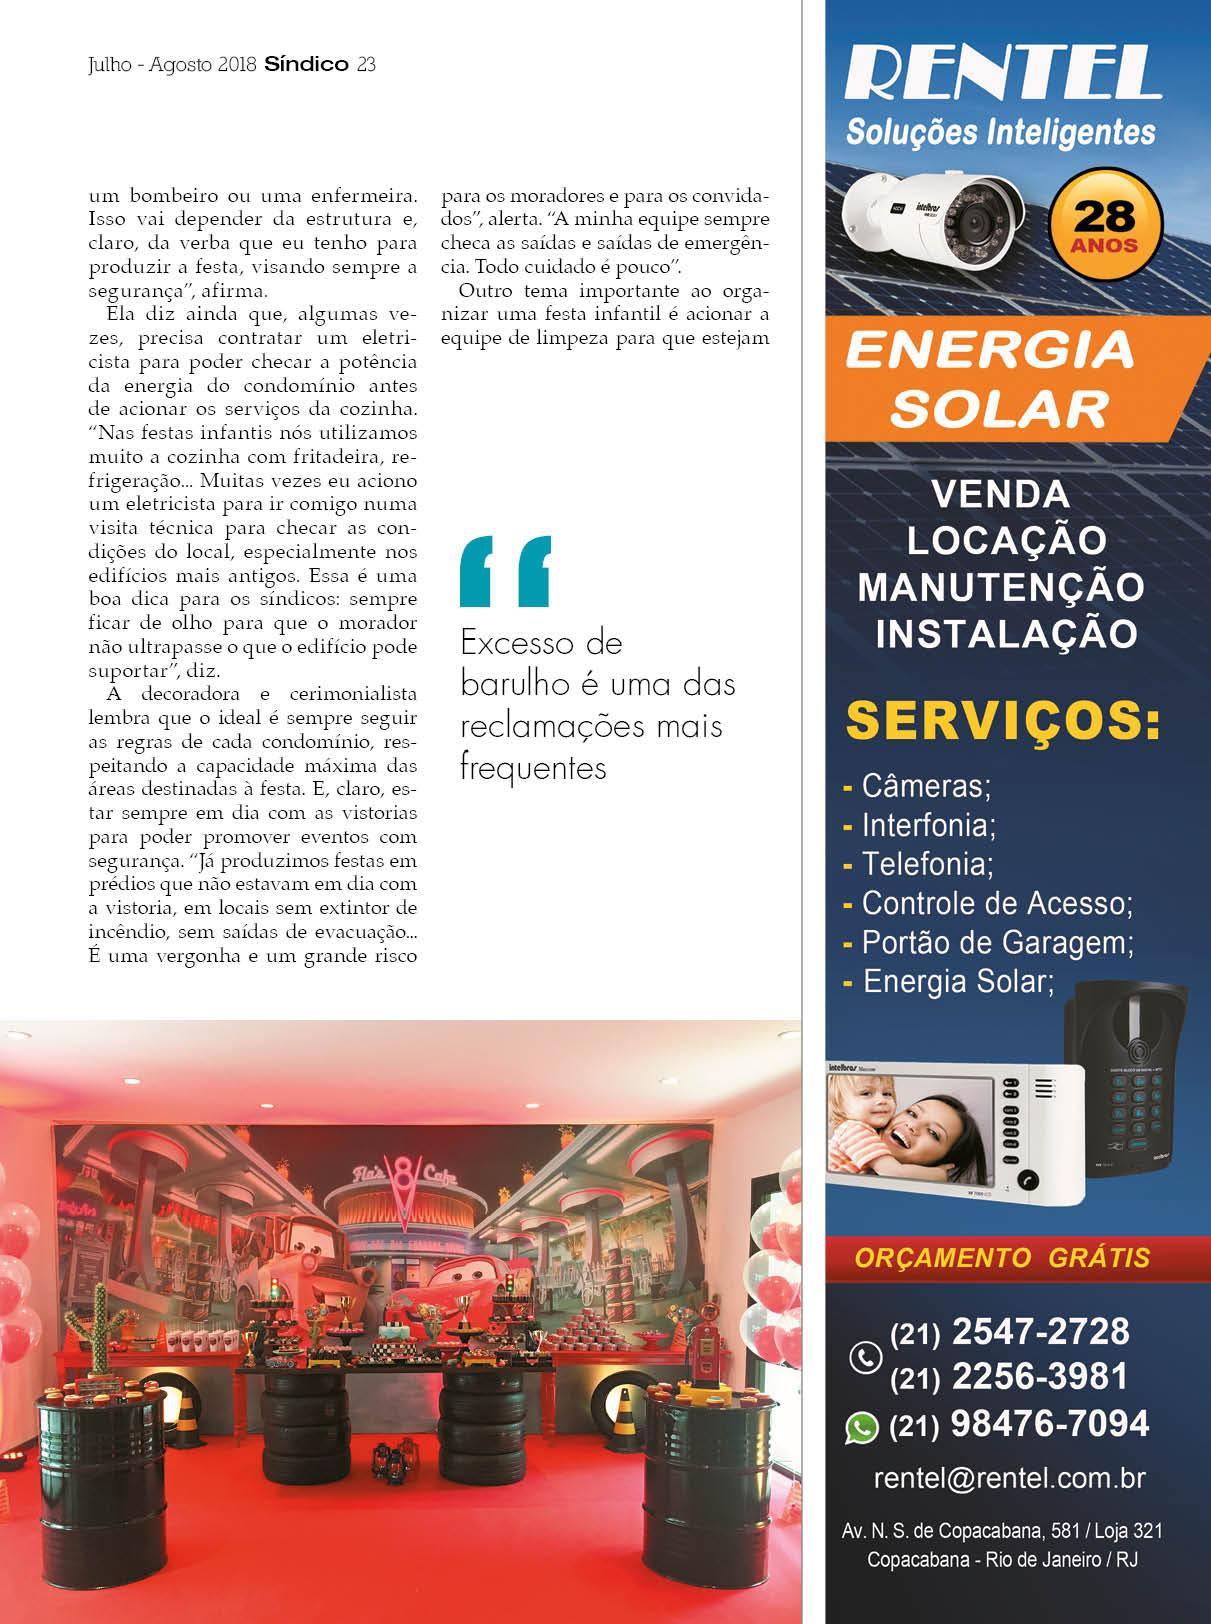 Revista Síndico_ed 23921